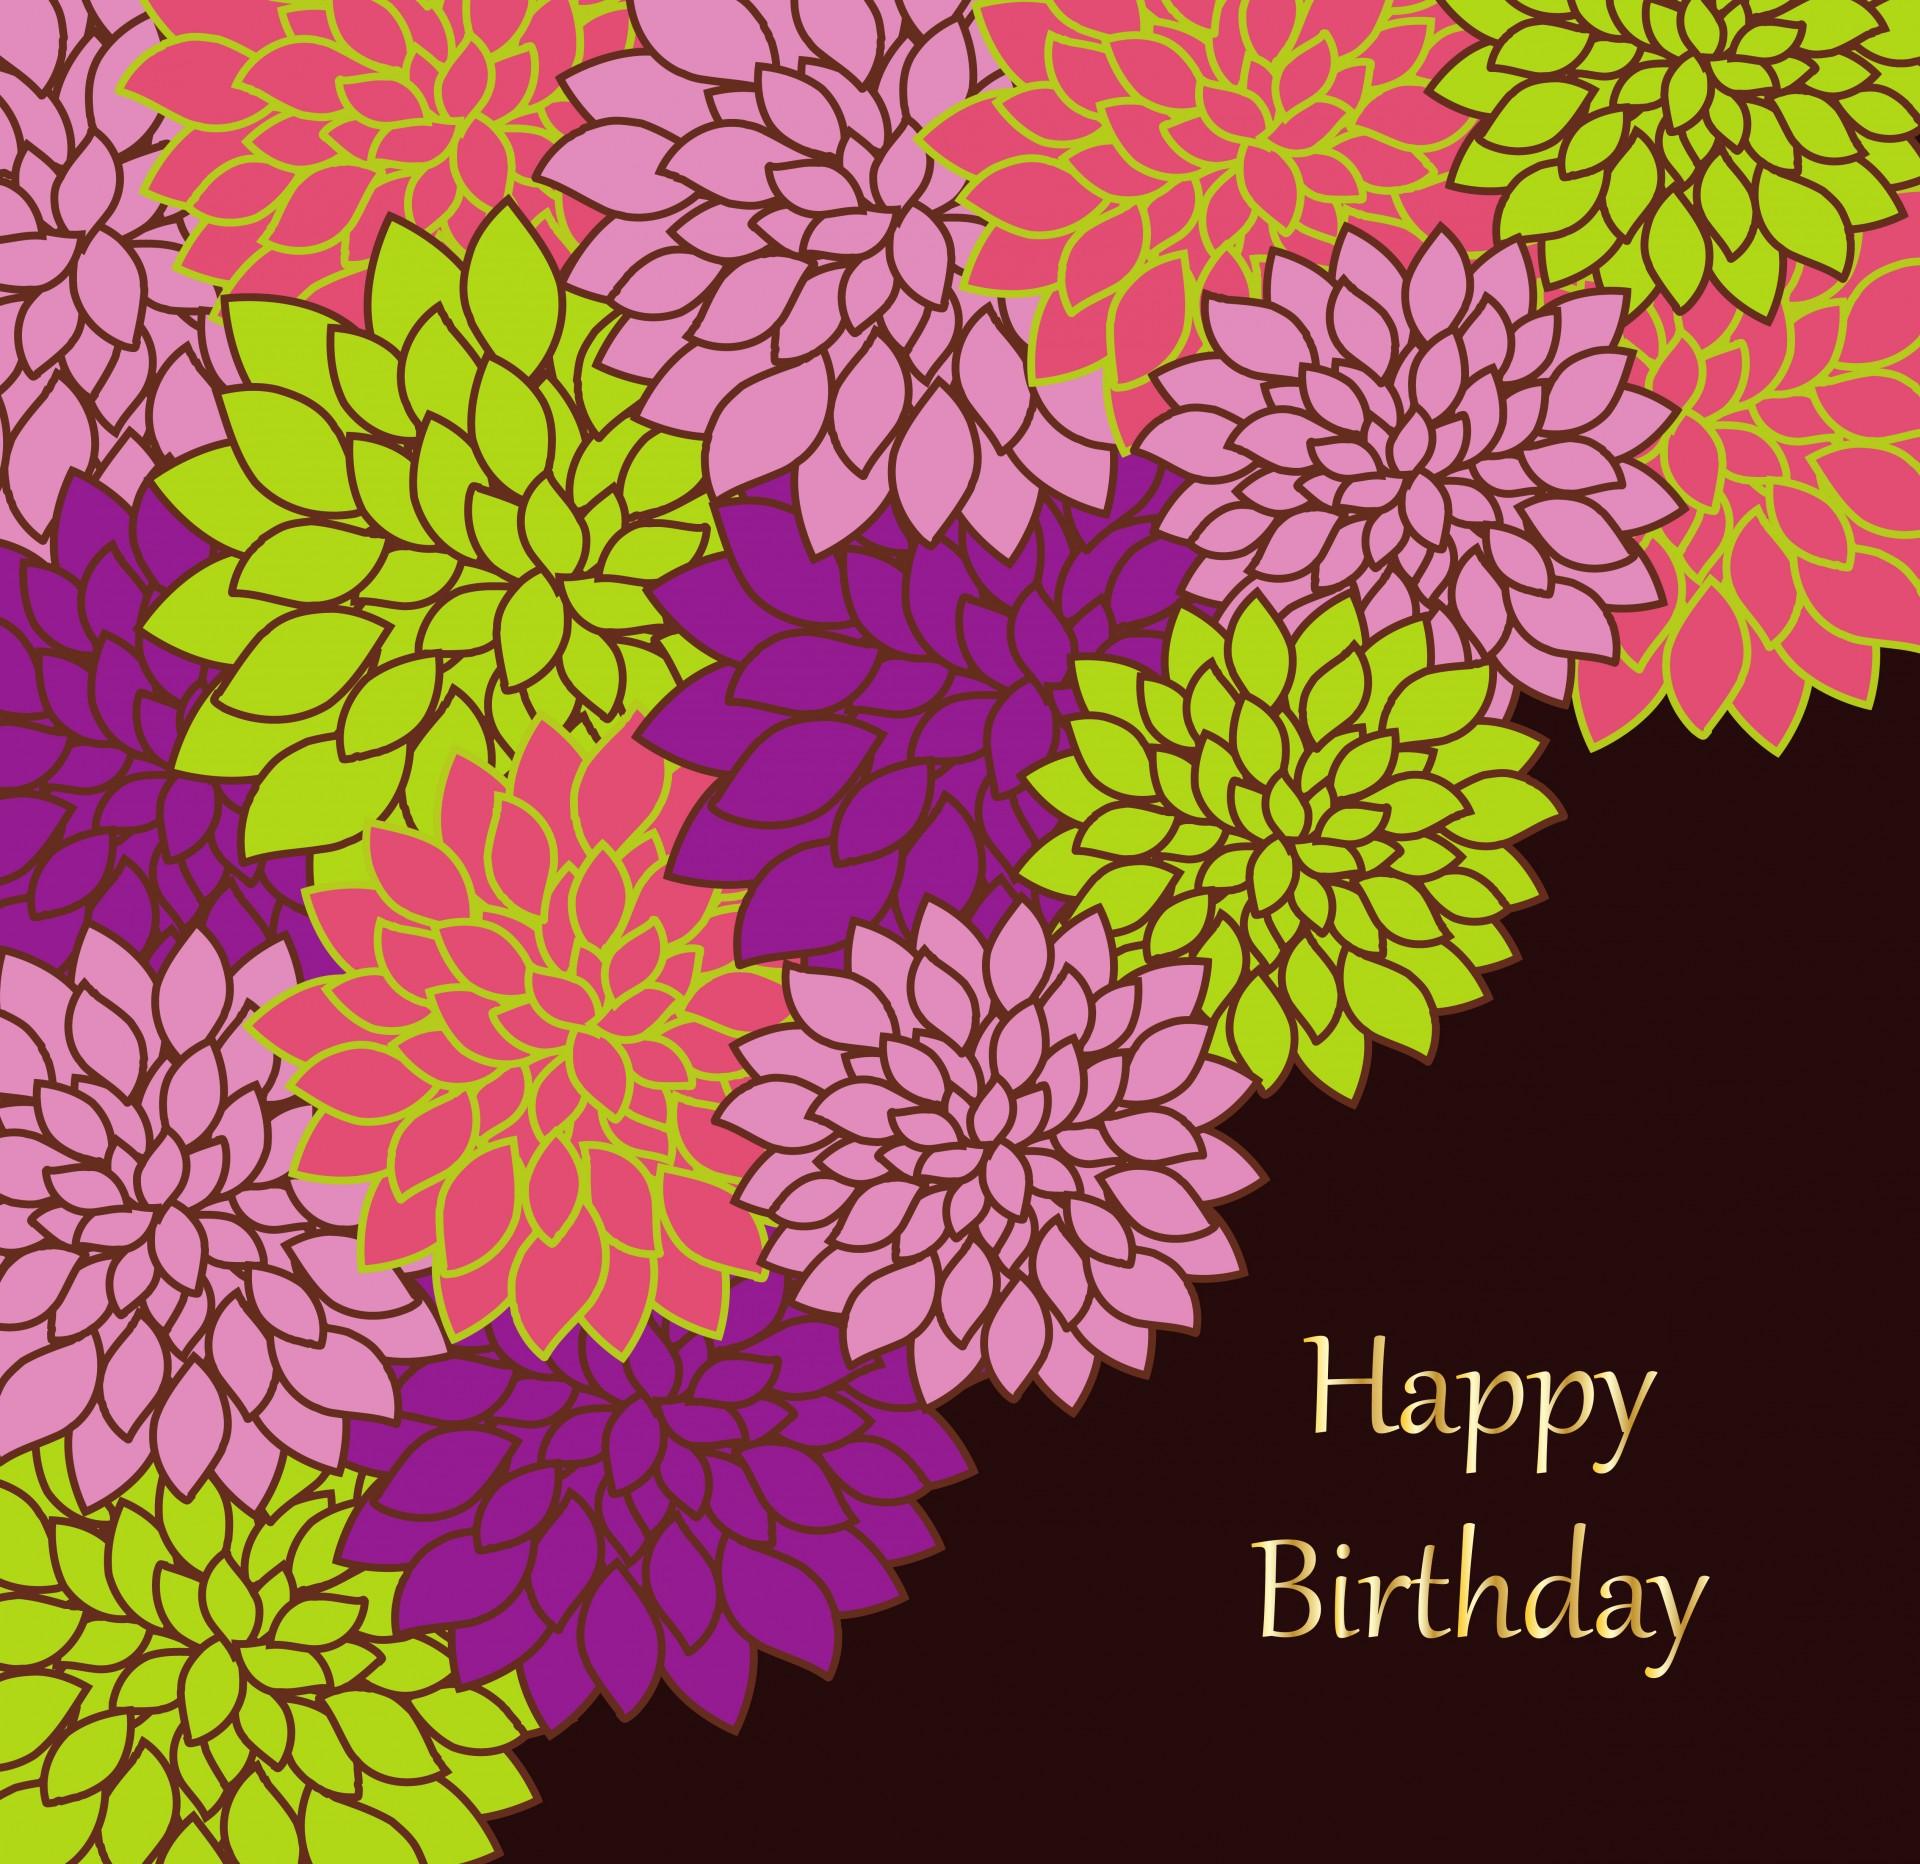 Birthday Cards Templates admissions clerk sample resume – Free Birthday Card Templates